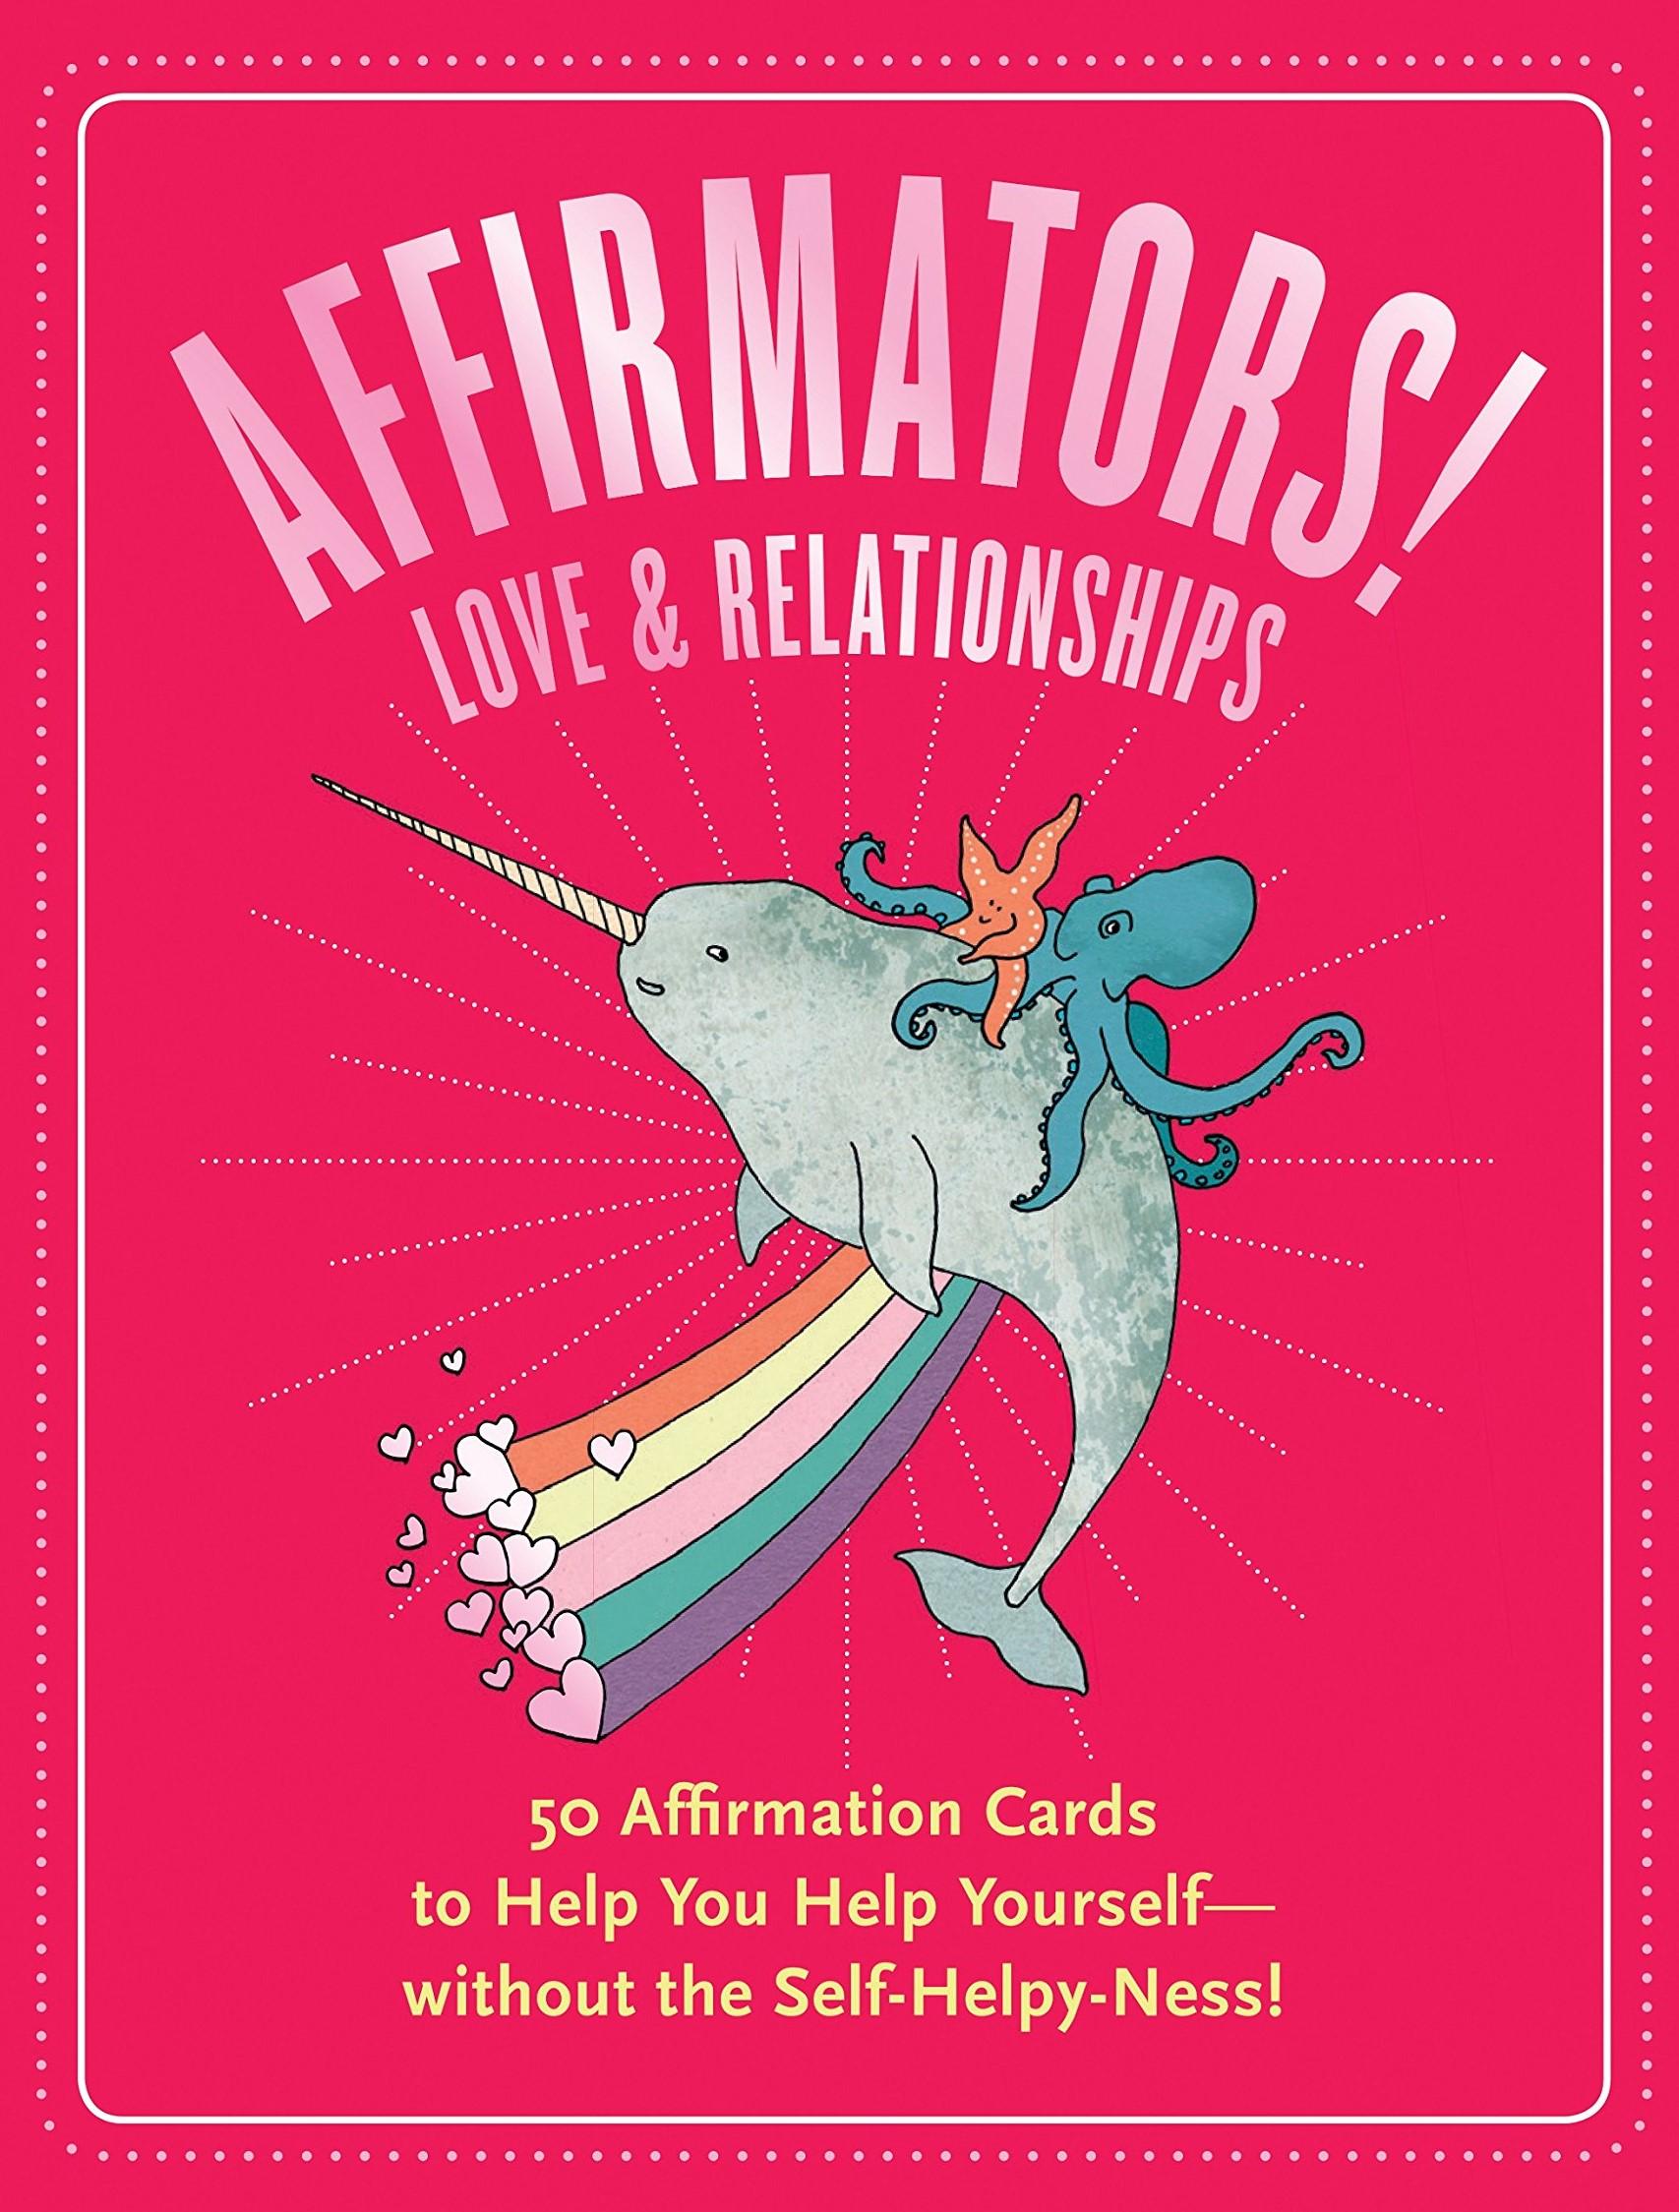 Affirmators! Love & Romance